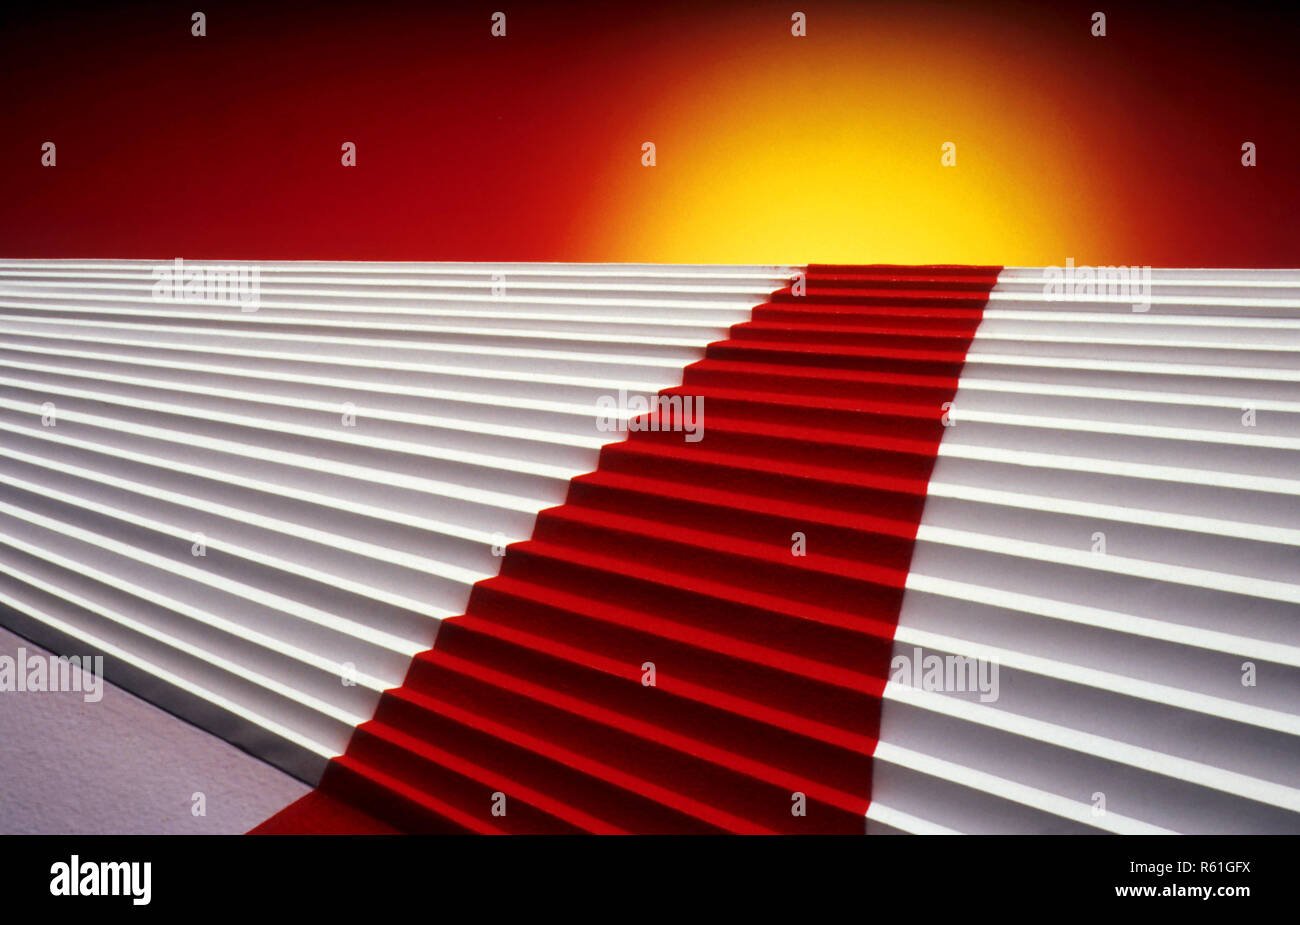 Roter Teppich auf Treppe Stockbild